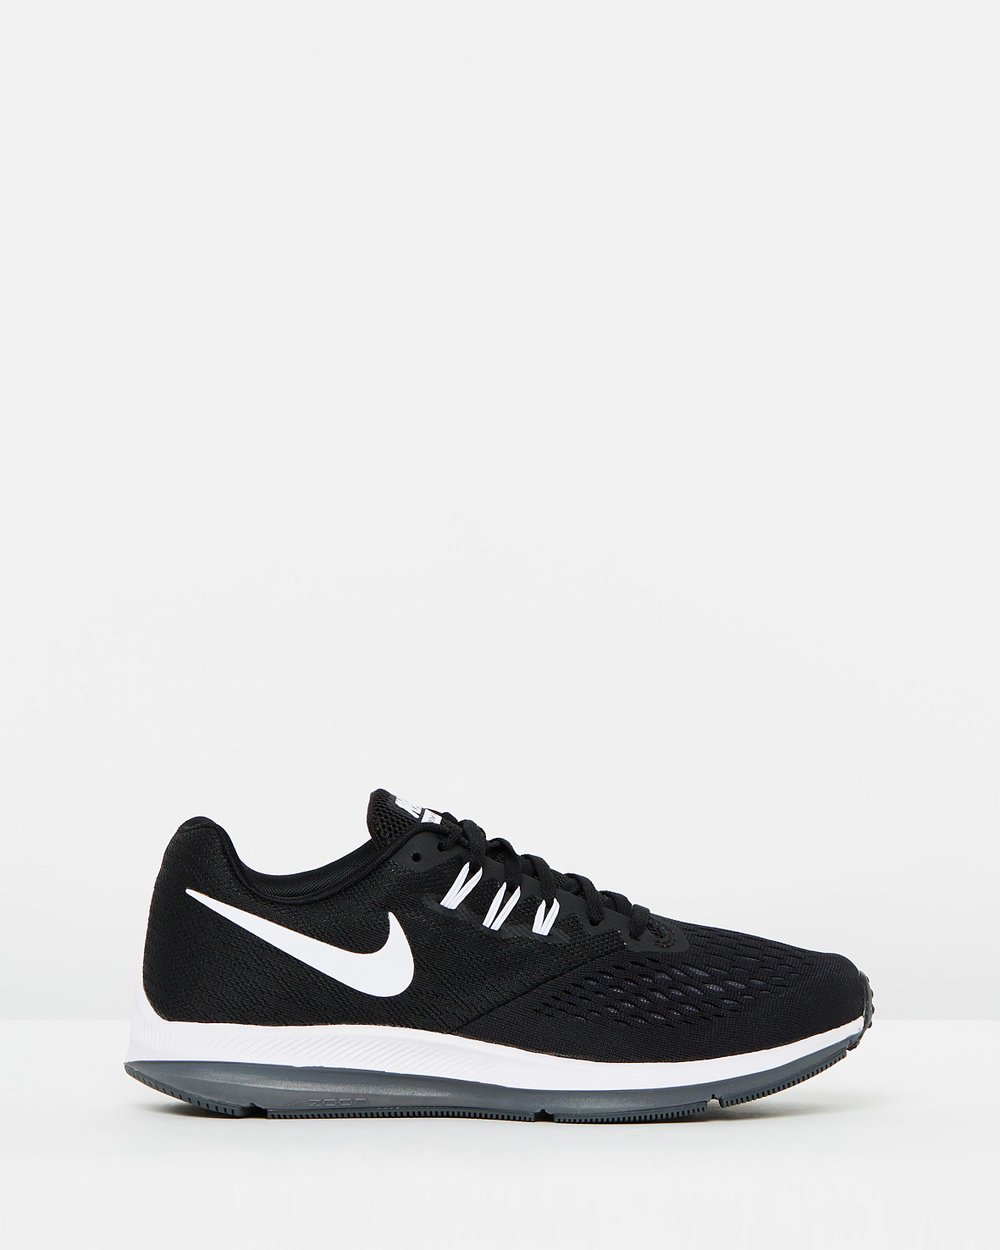 f5a1ada3b058 Air Zoom Winflo 4 - Women s by Nike Online